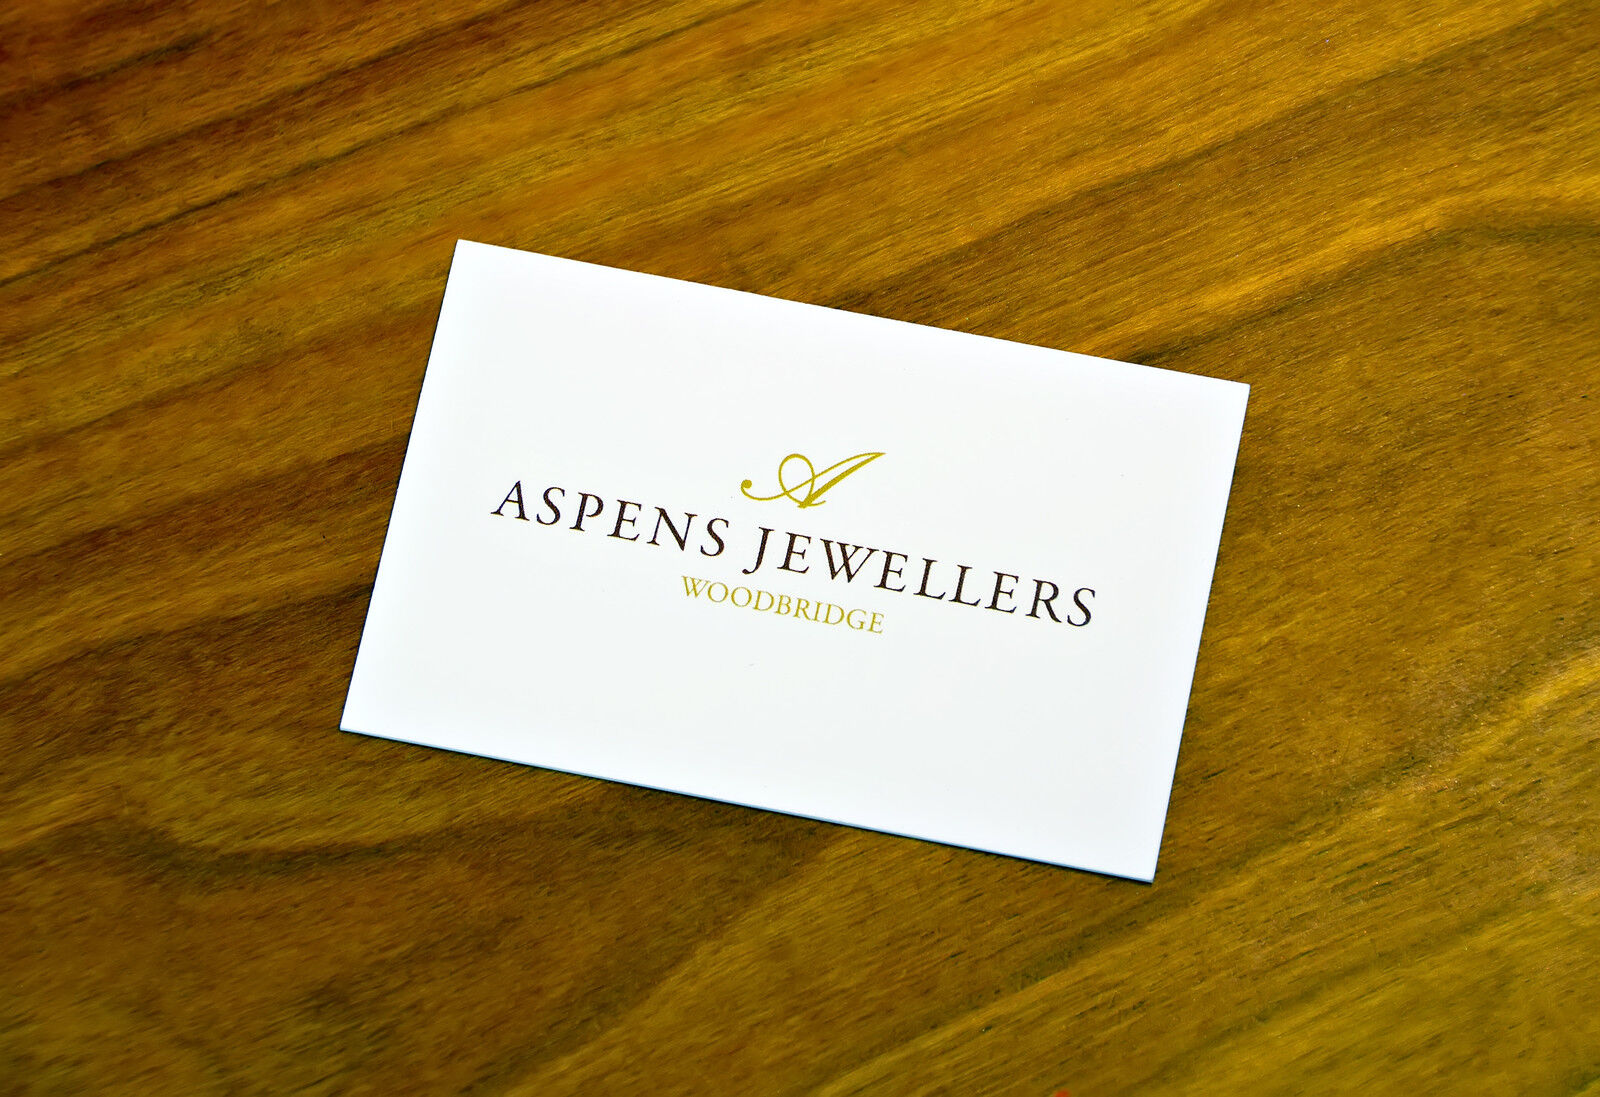 Aspens Jewellers